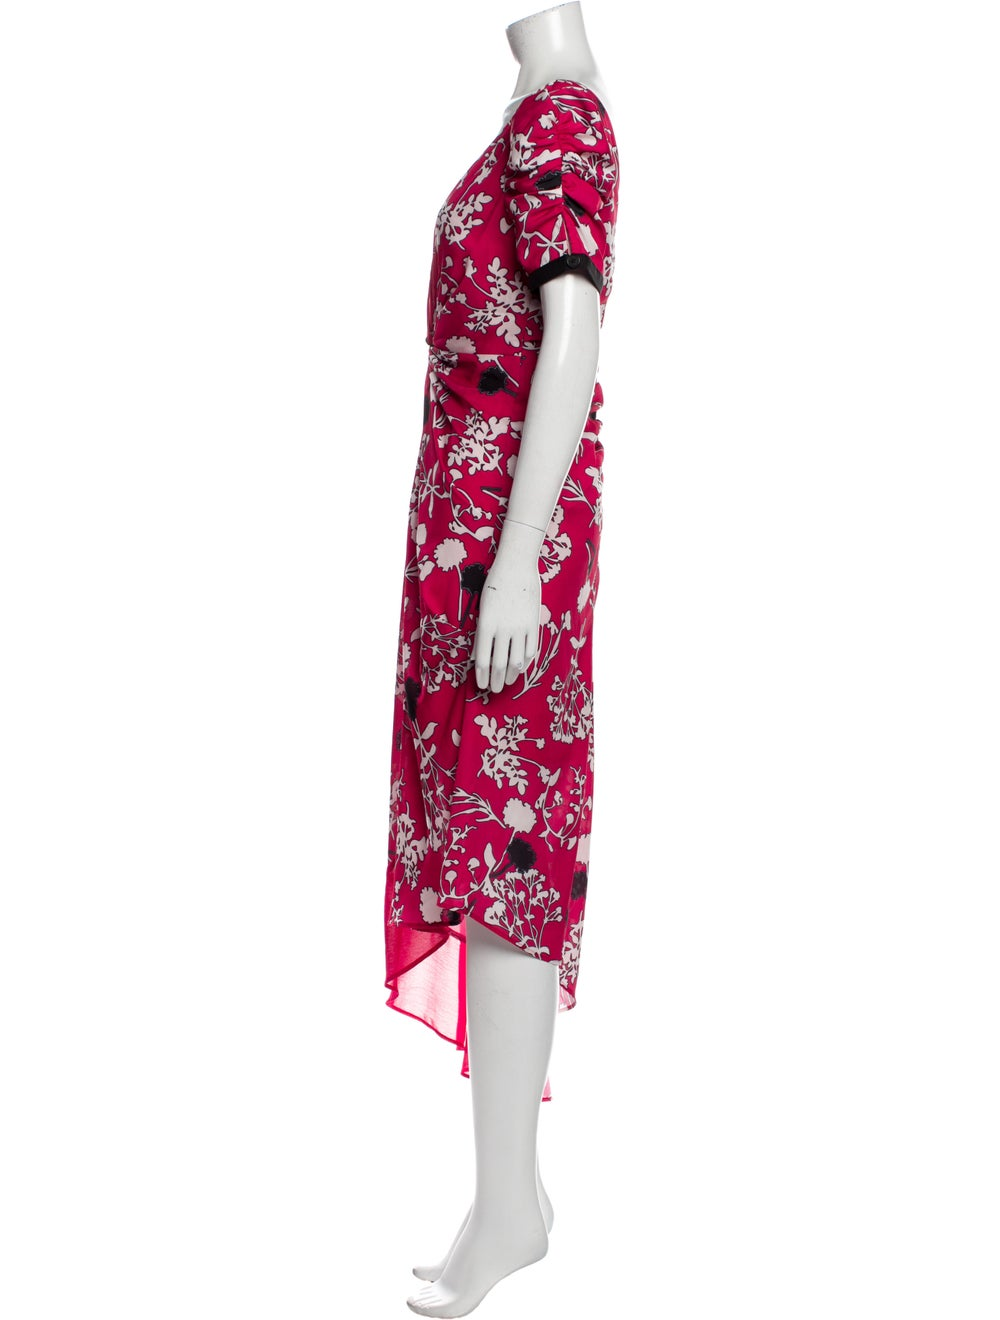 Self-Portrait Floral Print Long Dress Red - image 2